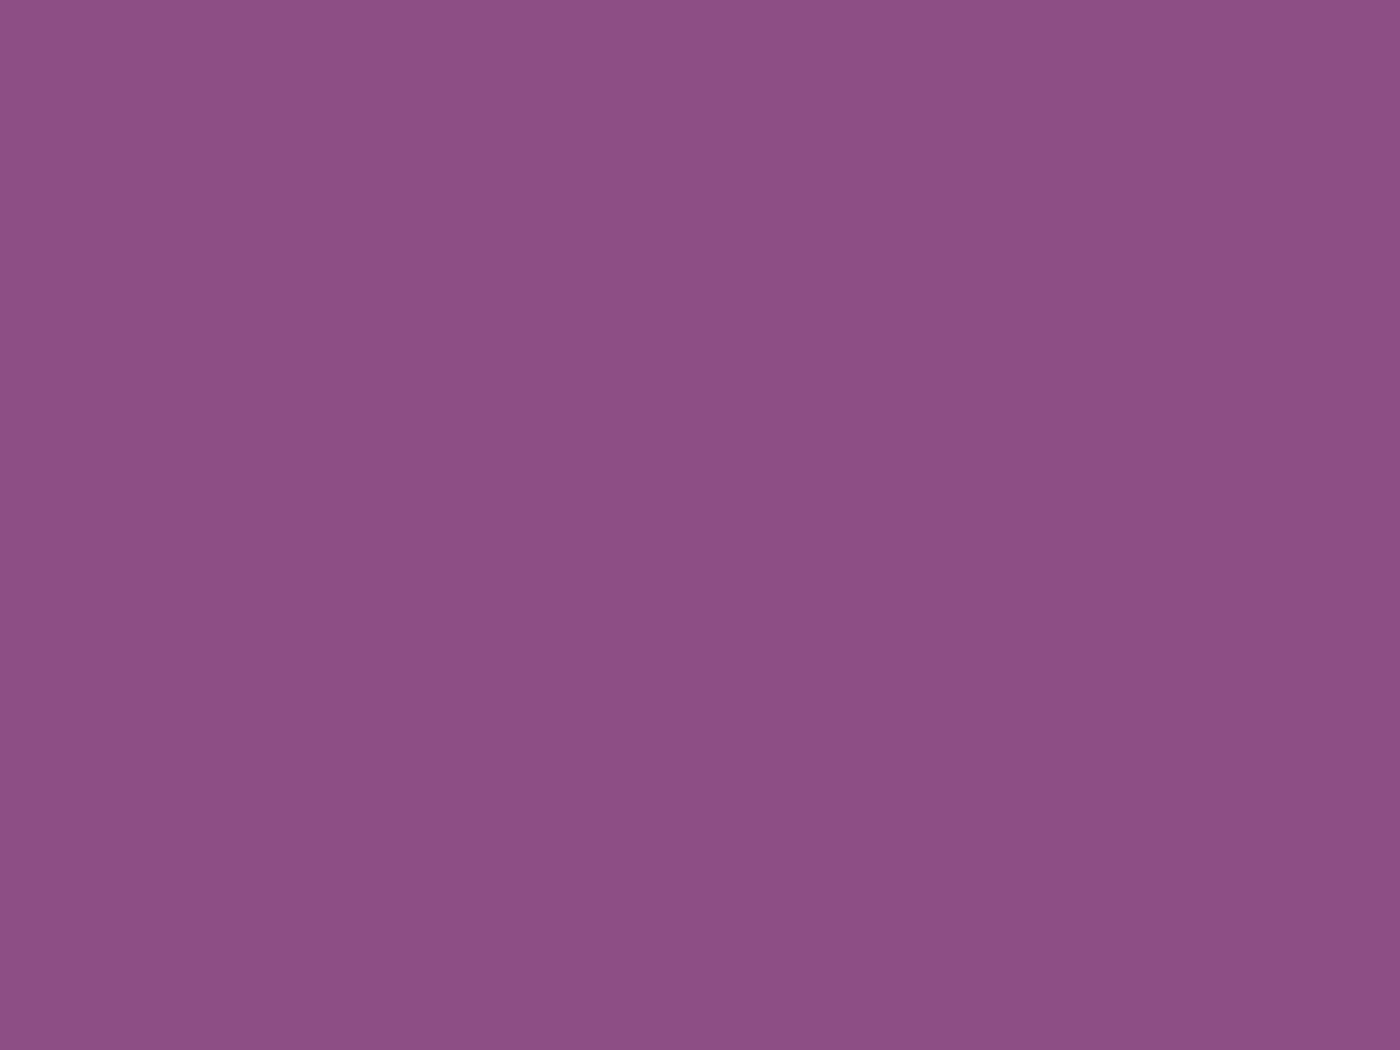 1400x1050 Razzmic Berry Solid Color Background